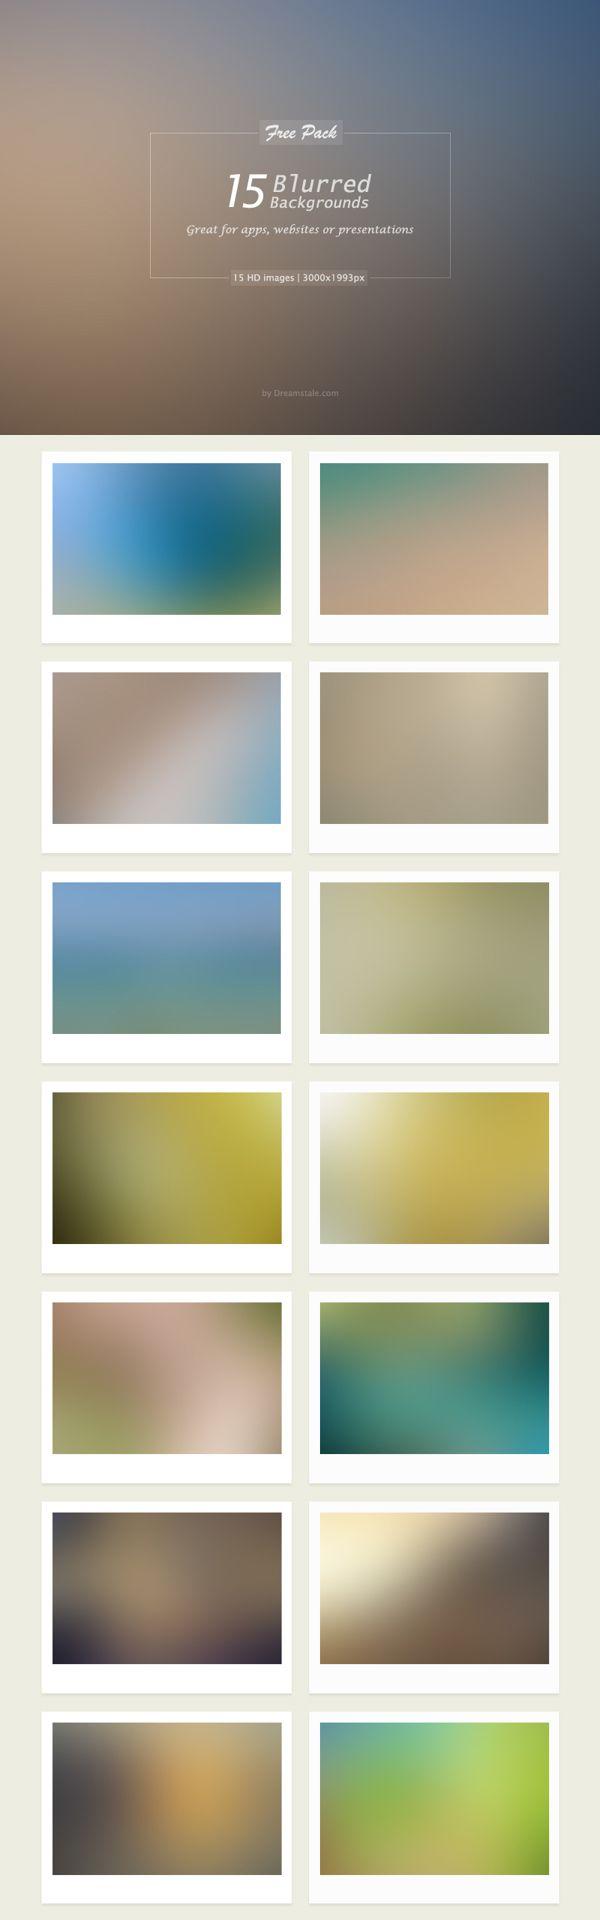 15 hd free blurred backgrounds web design pinterest web design